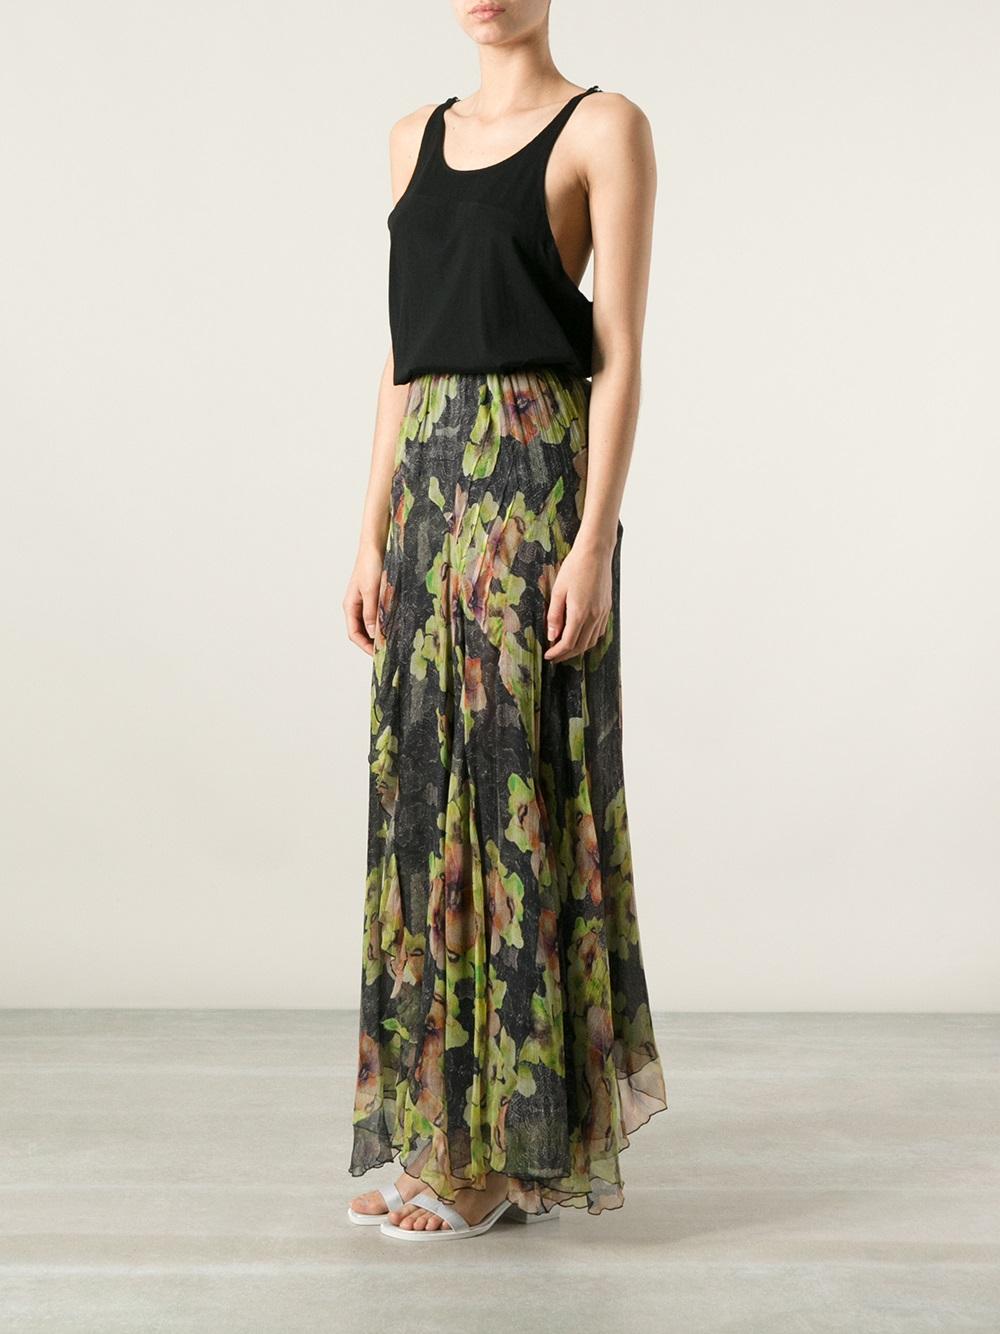 fe84fce68 Isabel Marant Floral Print Maxi Skirt in Black - Lyst